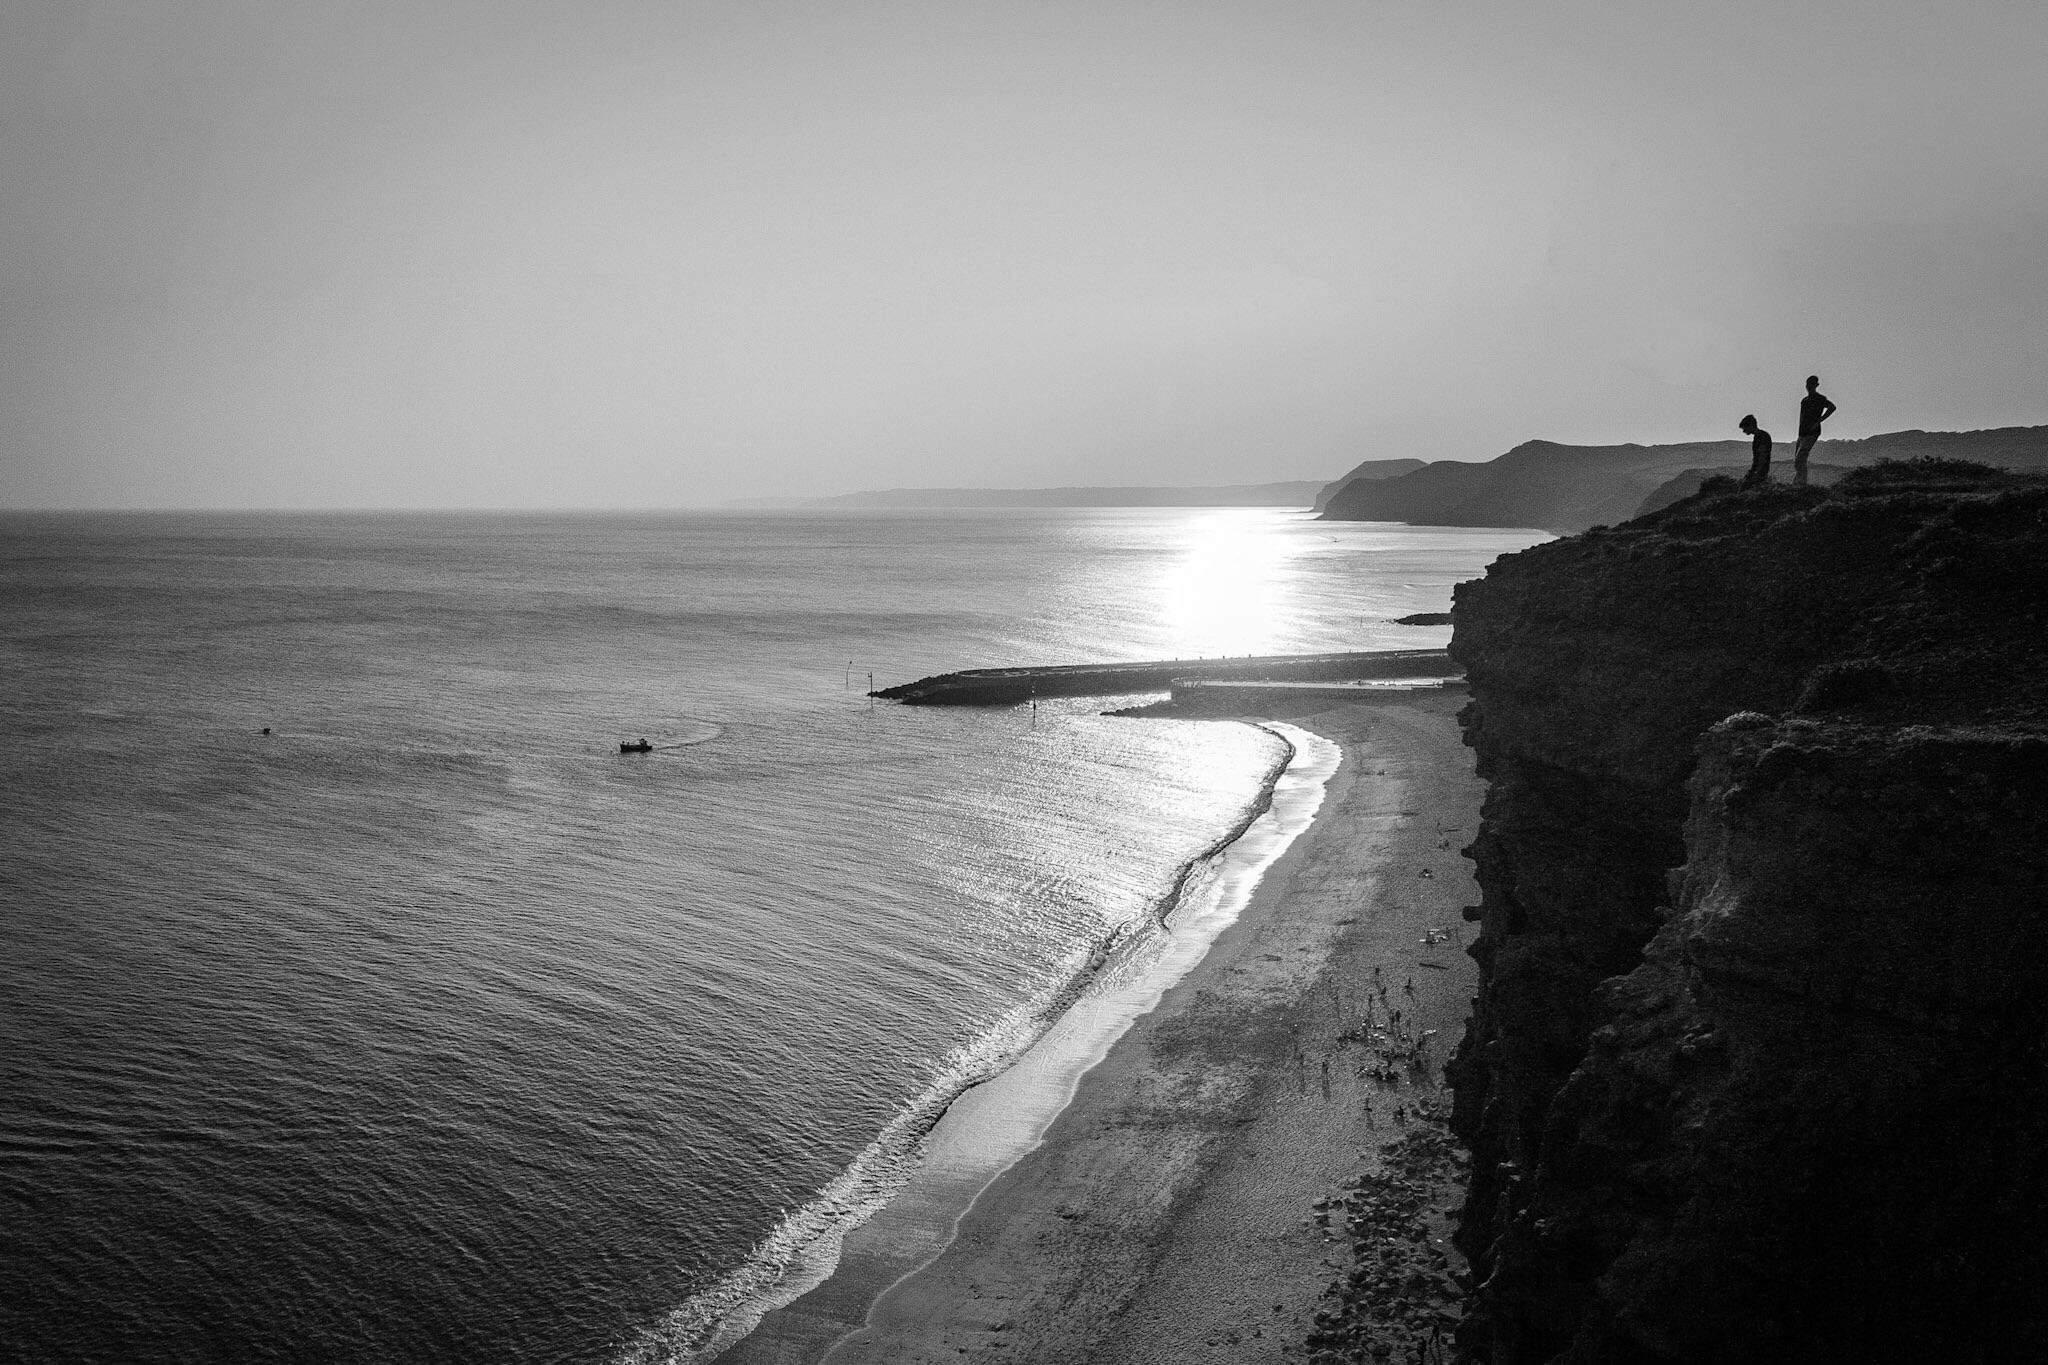 Black and white landscape photography by Rick McEvoy